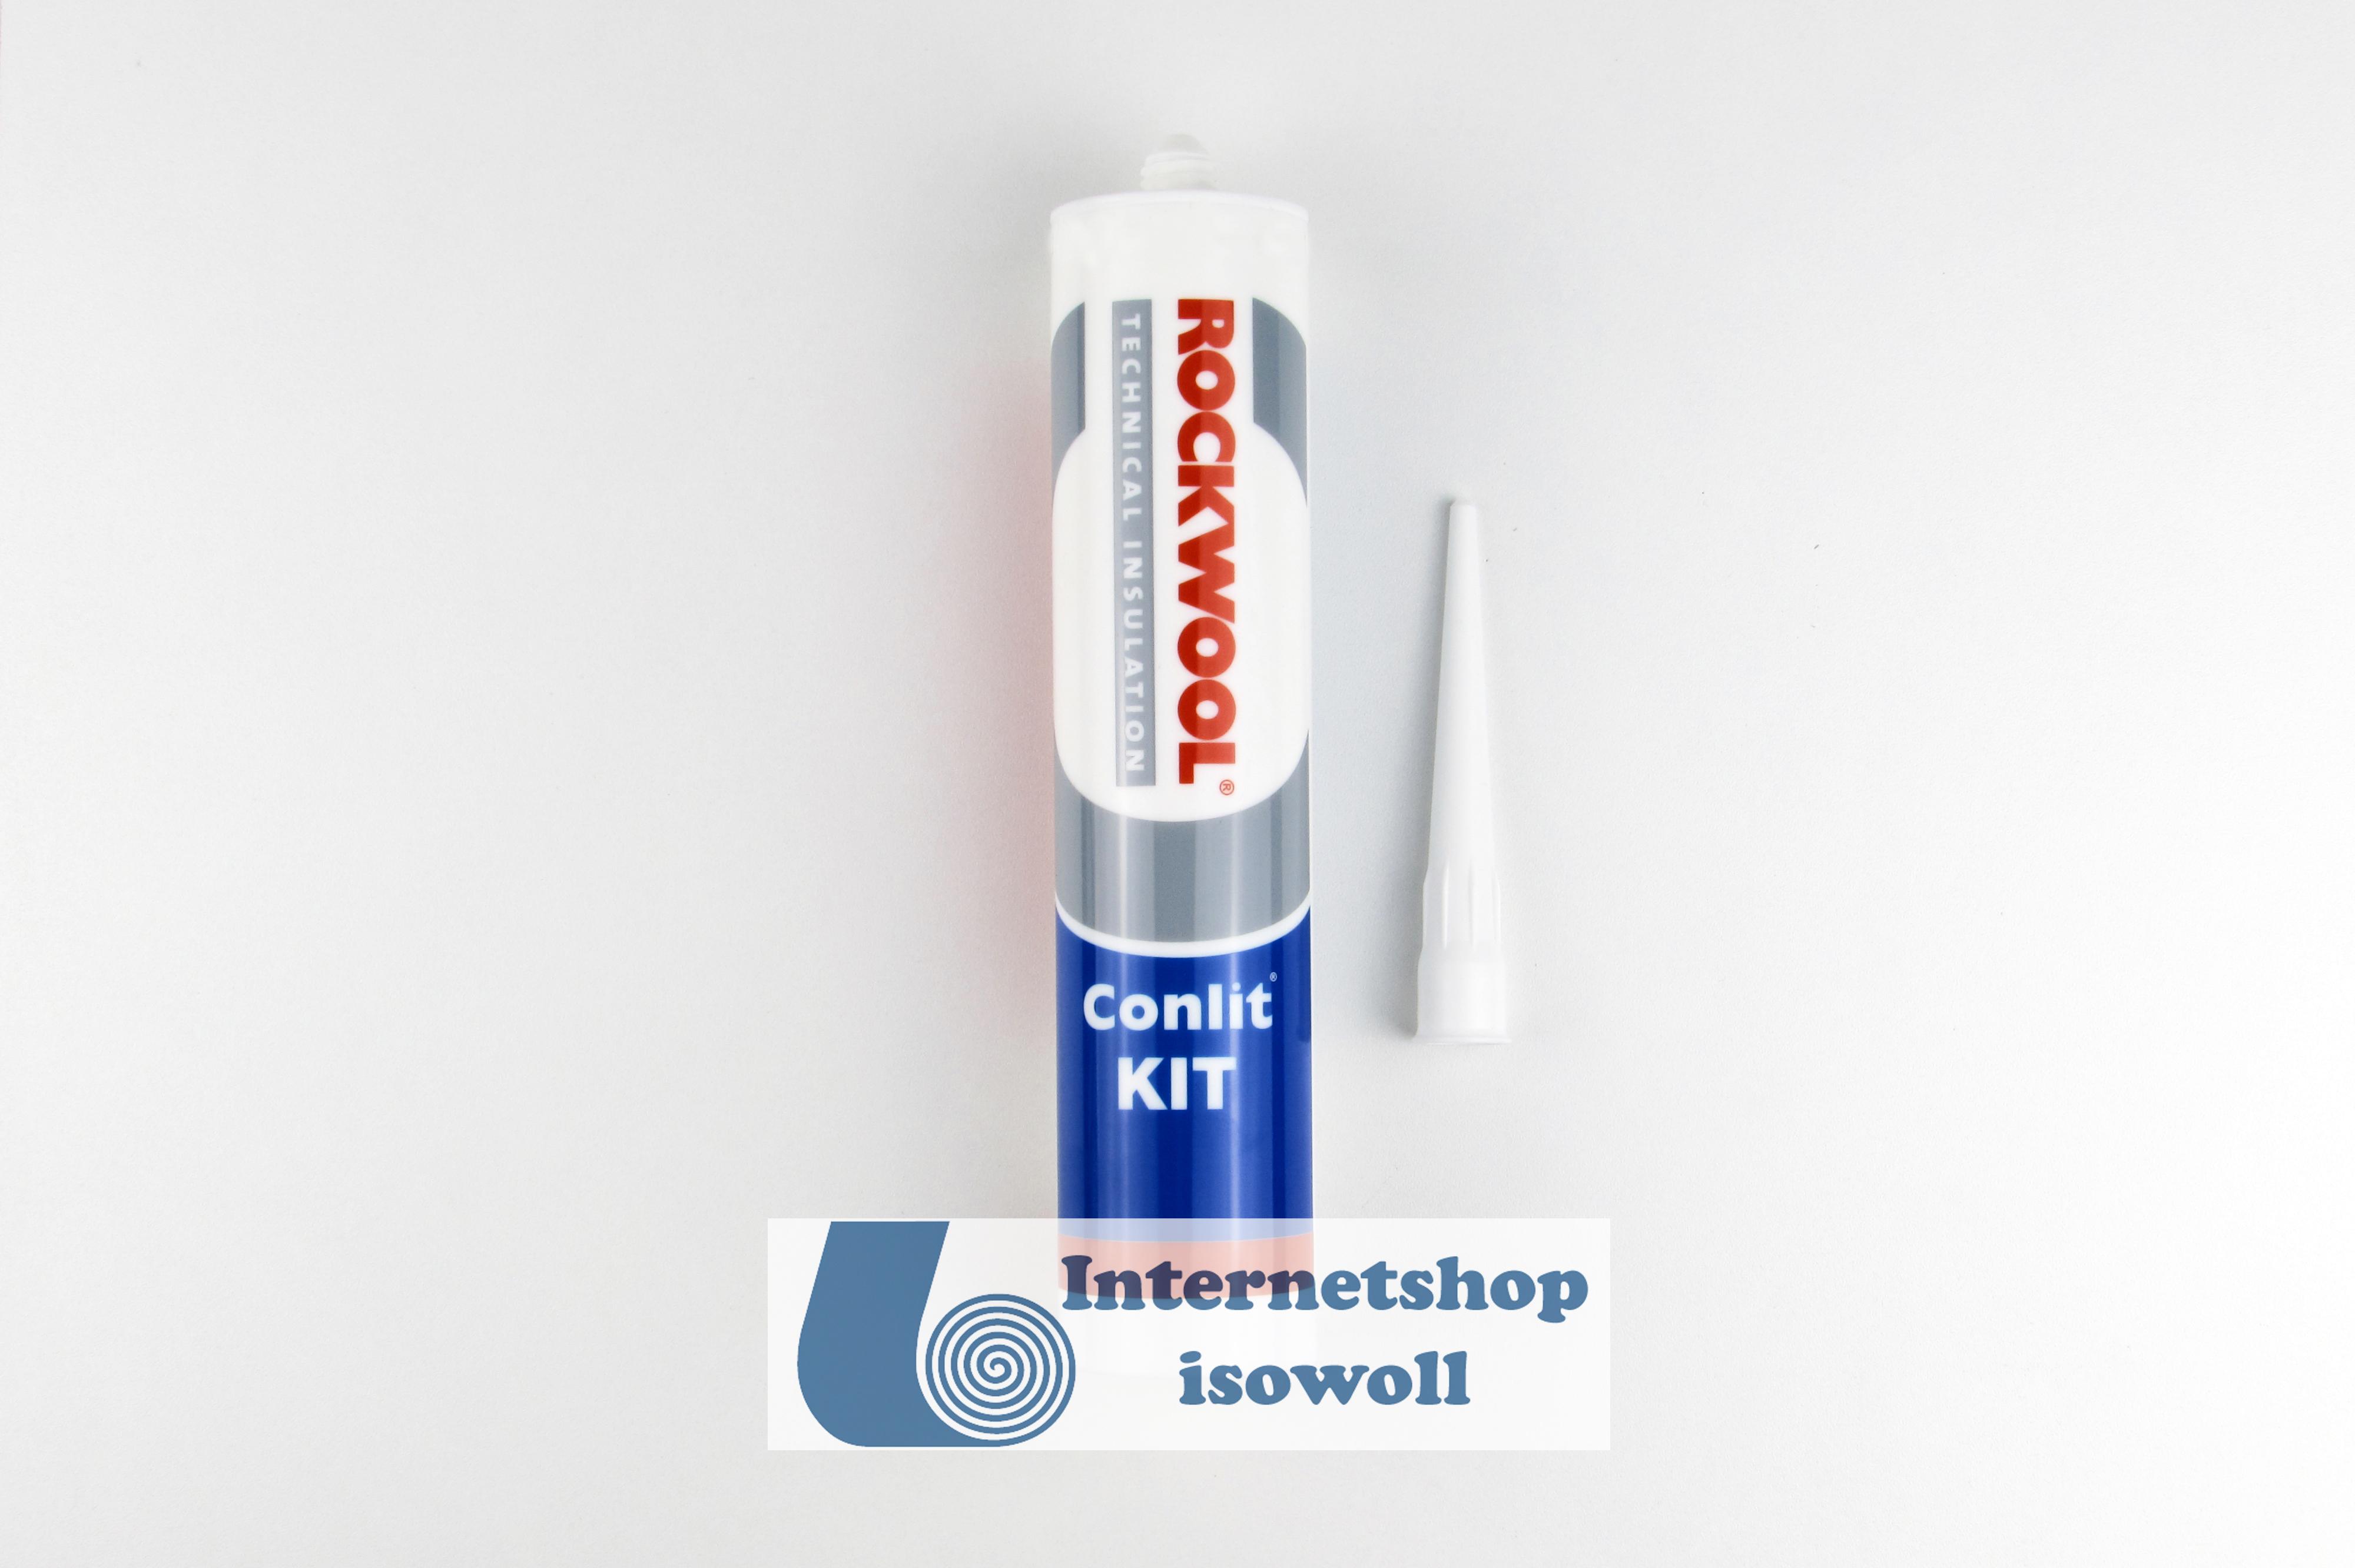 rockwool conlit kit isowoll onlineshop f r. Black Bedroom Furniture Sets. Home Design Ideas